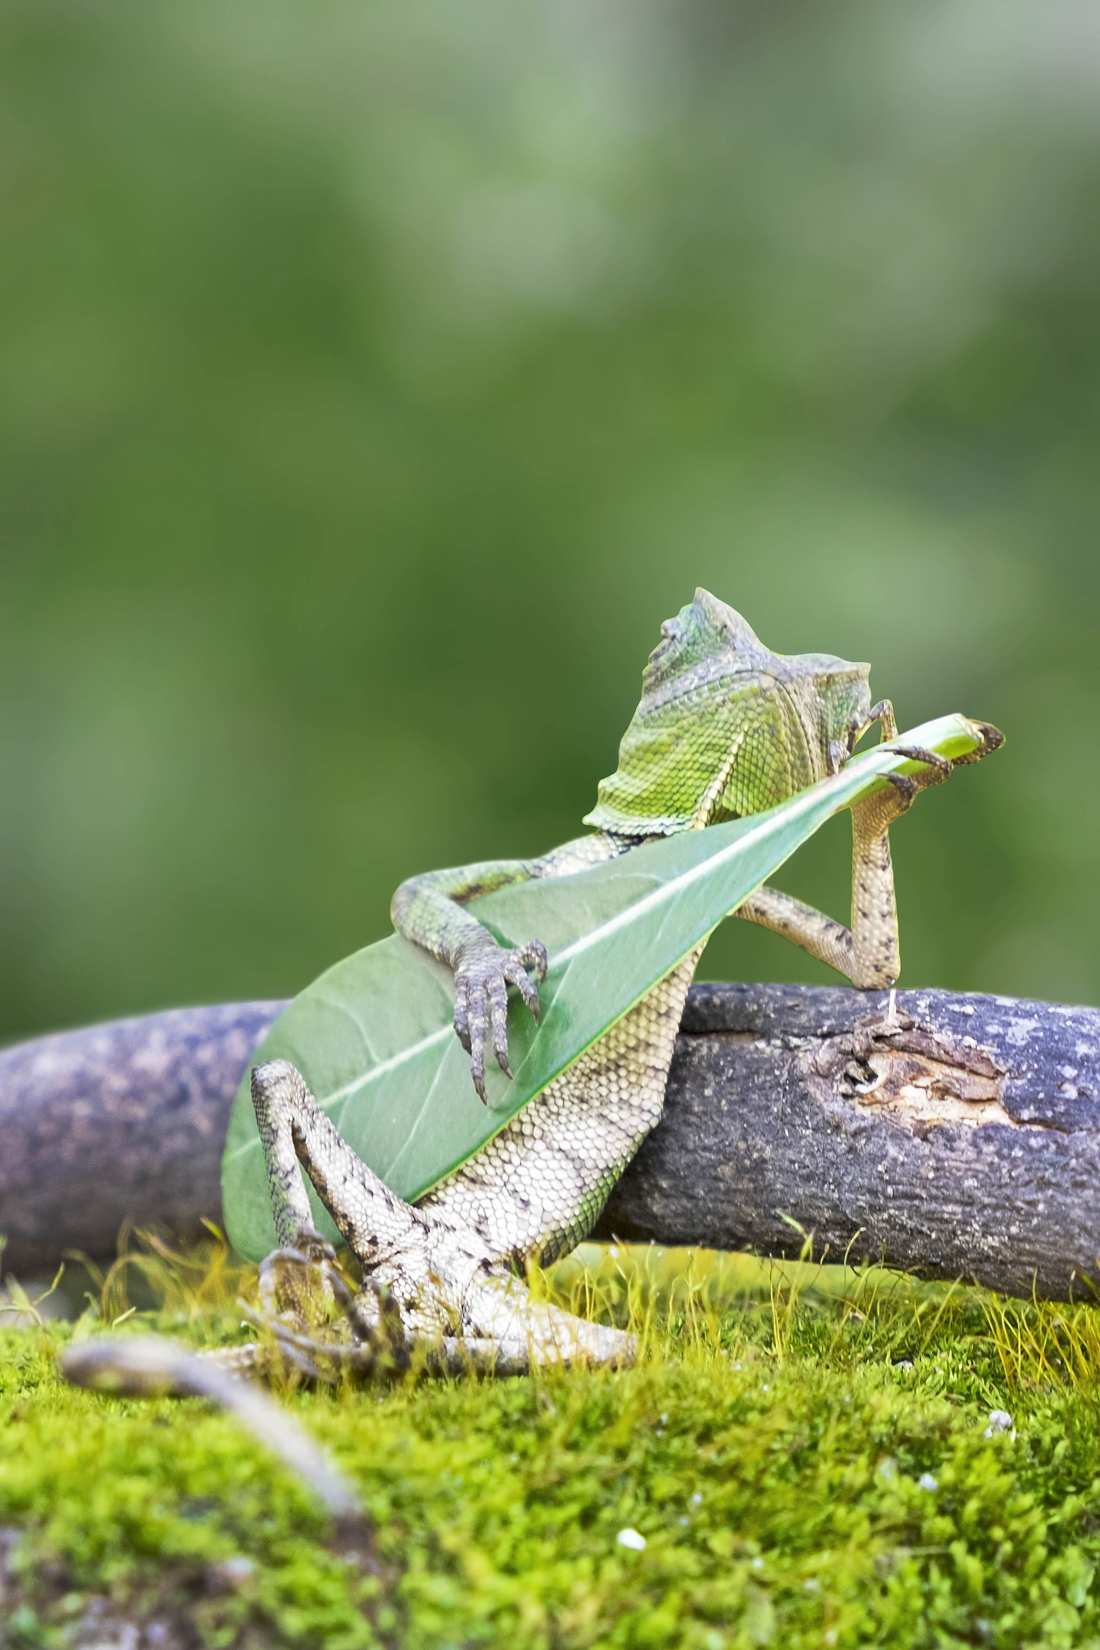 Lizard playing leaf © Charles Saatchi